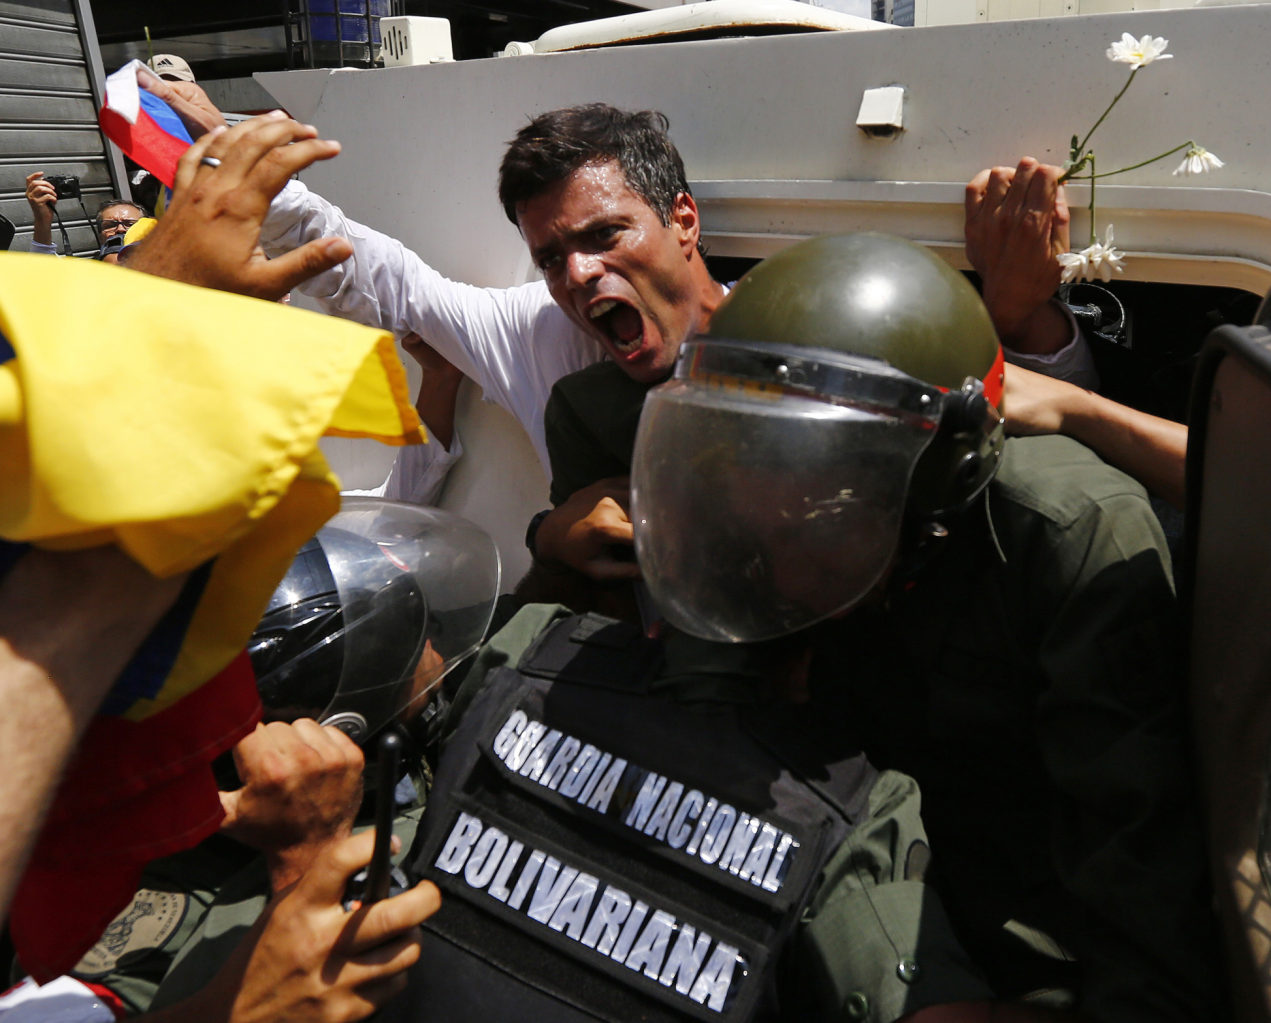 """Revolucion"" au Venezuela ? 6a37f2a0-98de-11e3-bcfd-8d0f6ac8a4e4"